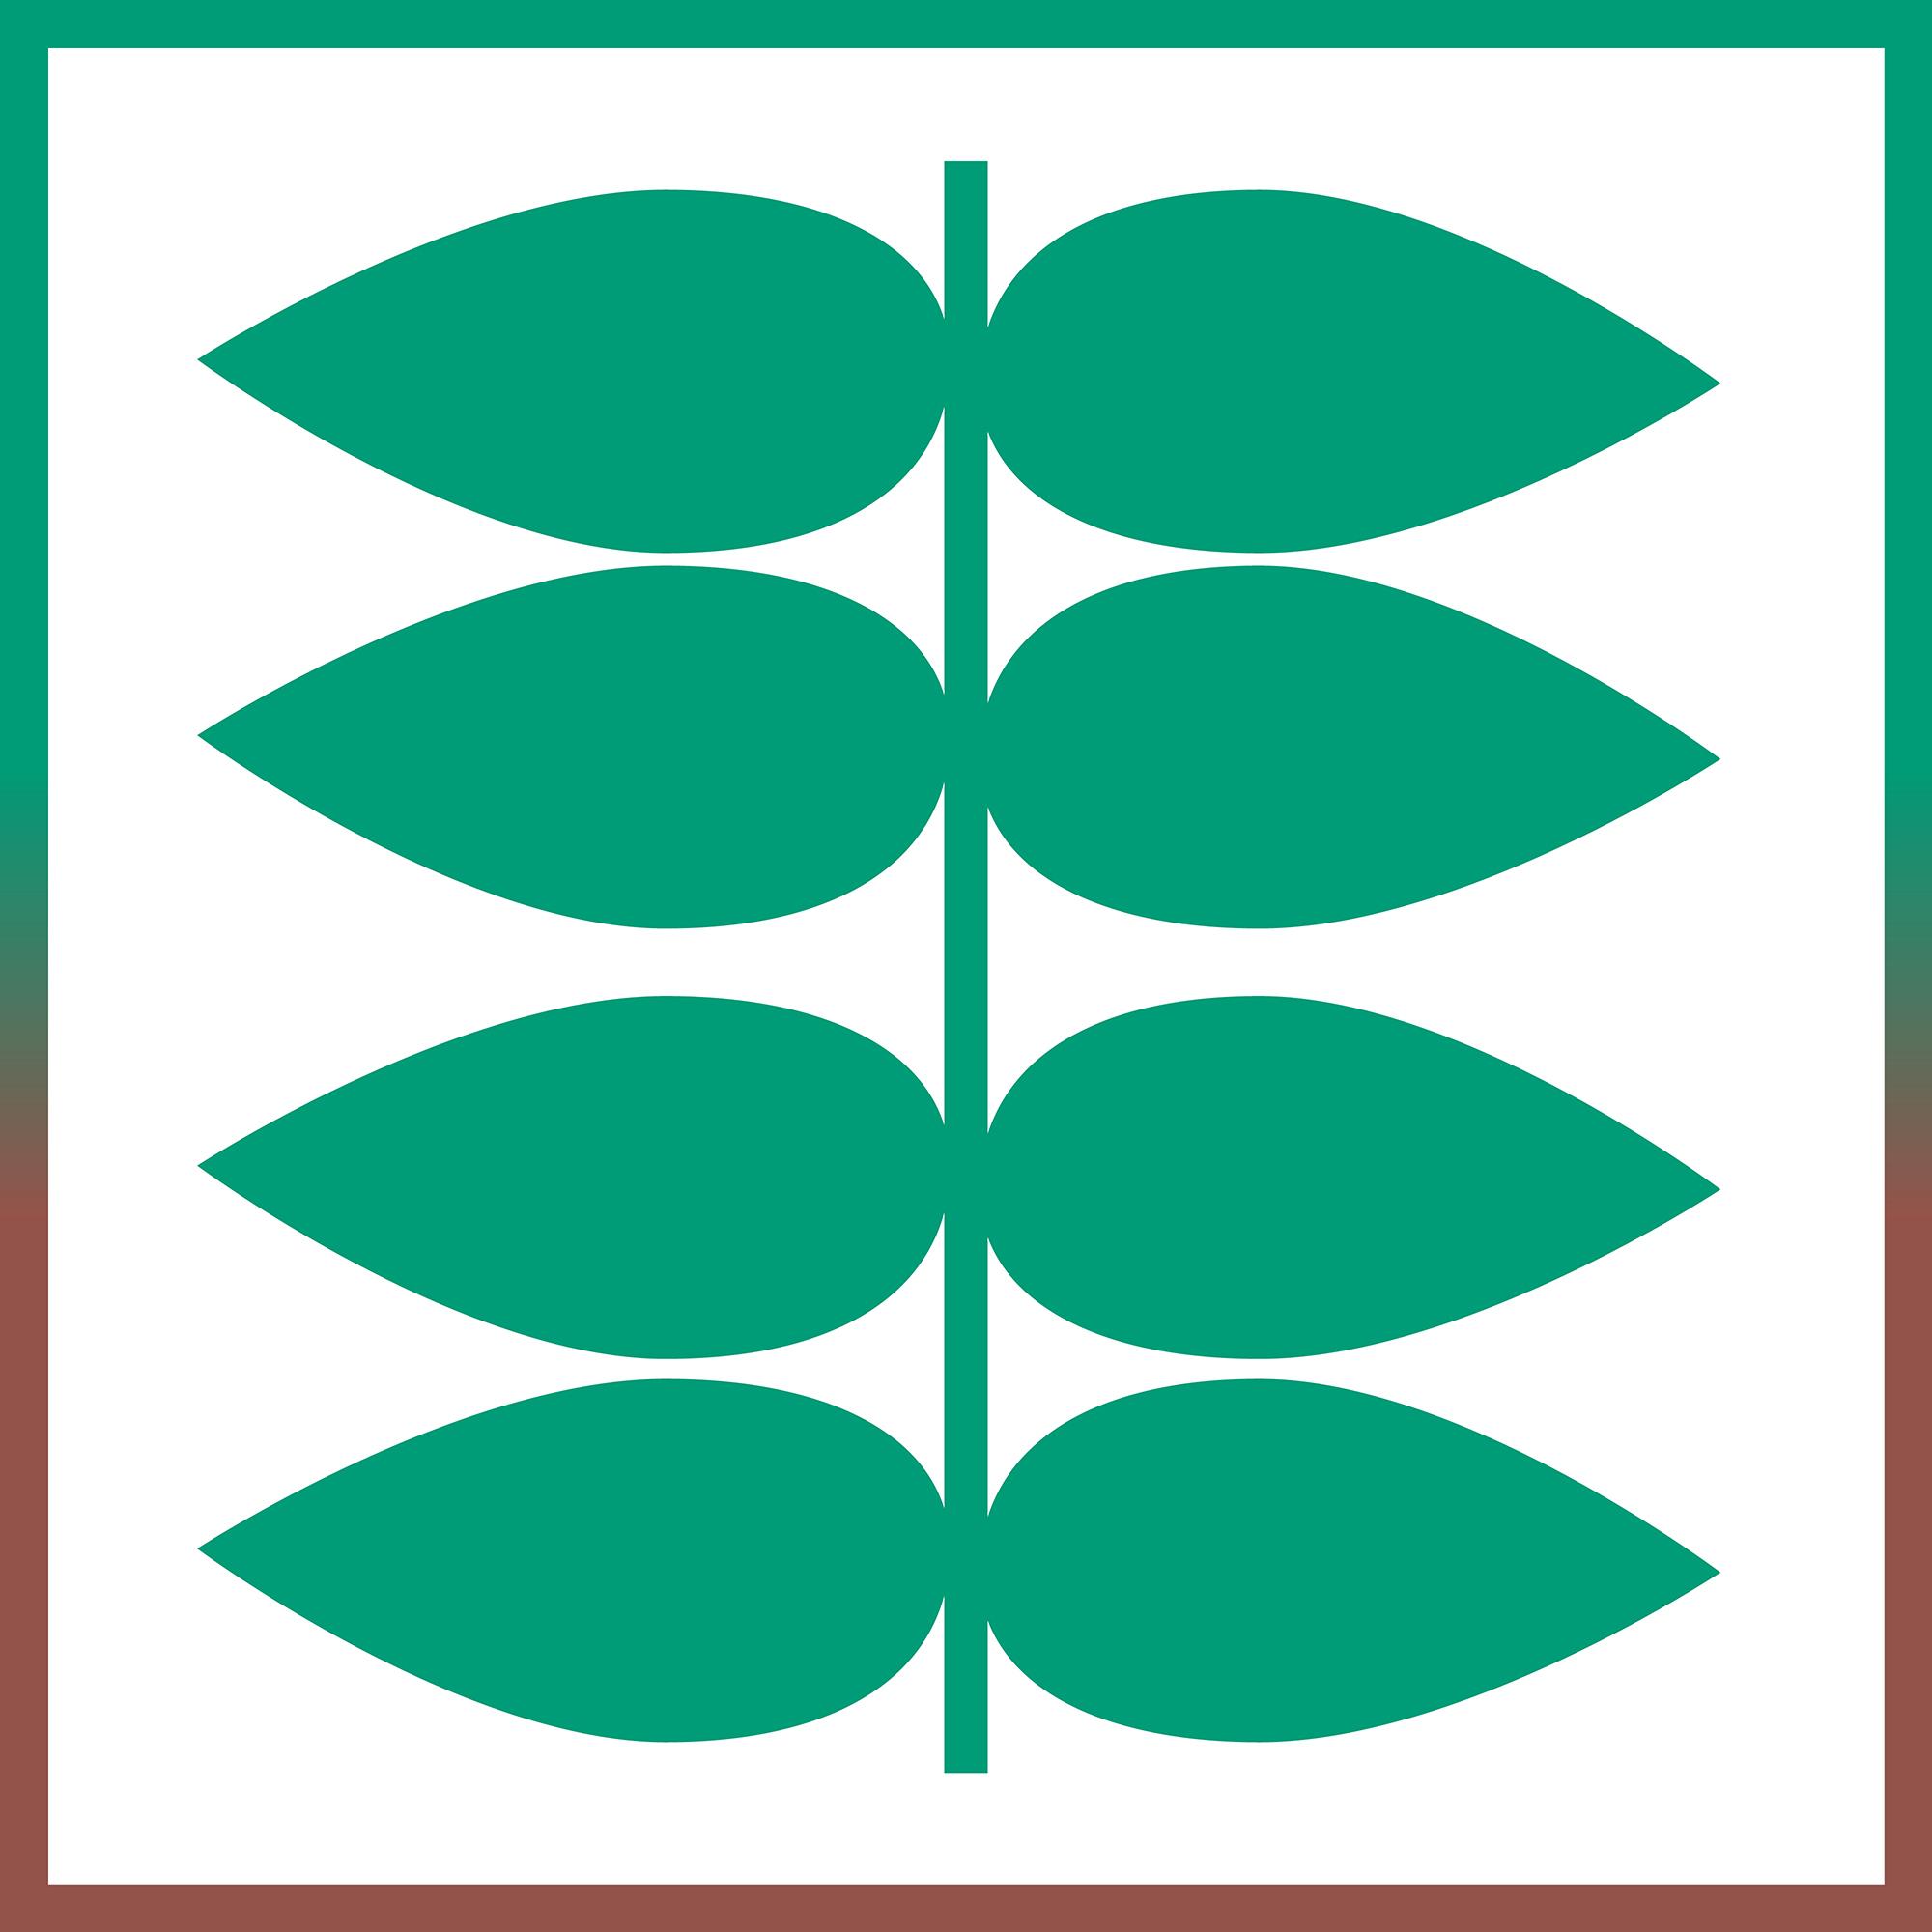 Artistic residency / Natalia Komorowska. Eco-herbarium